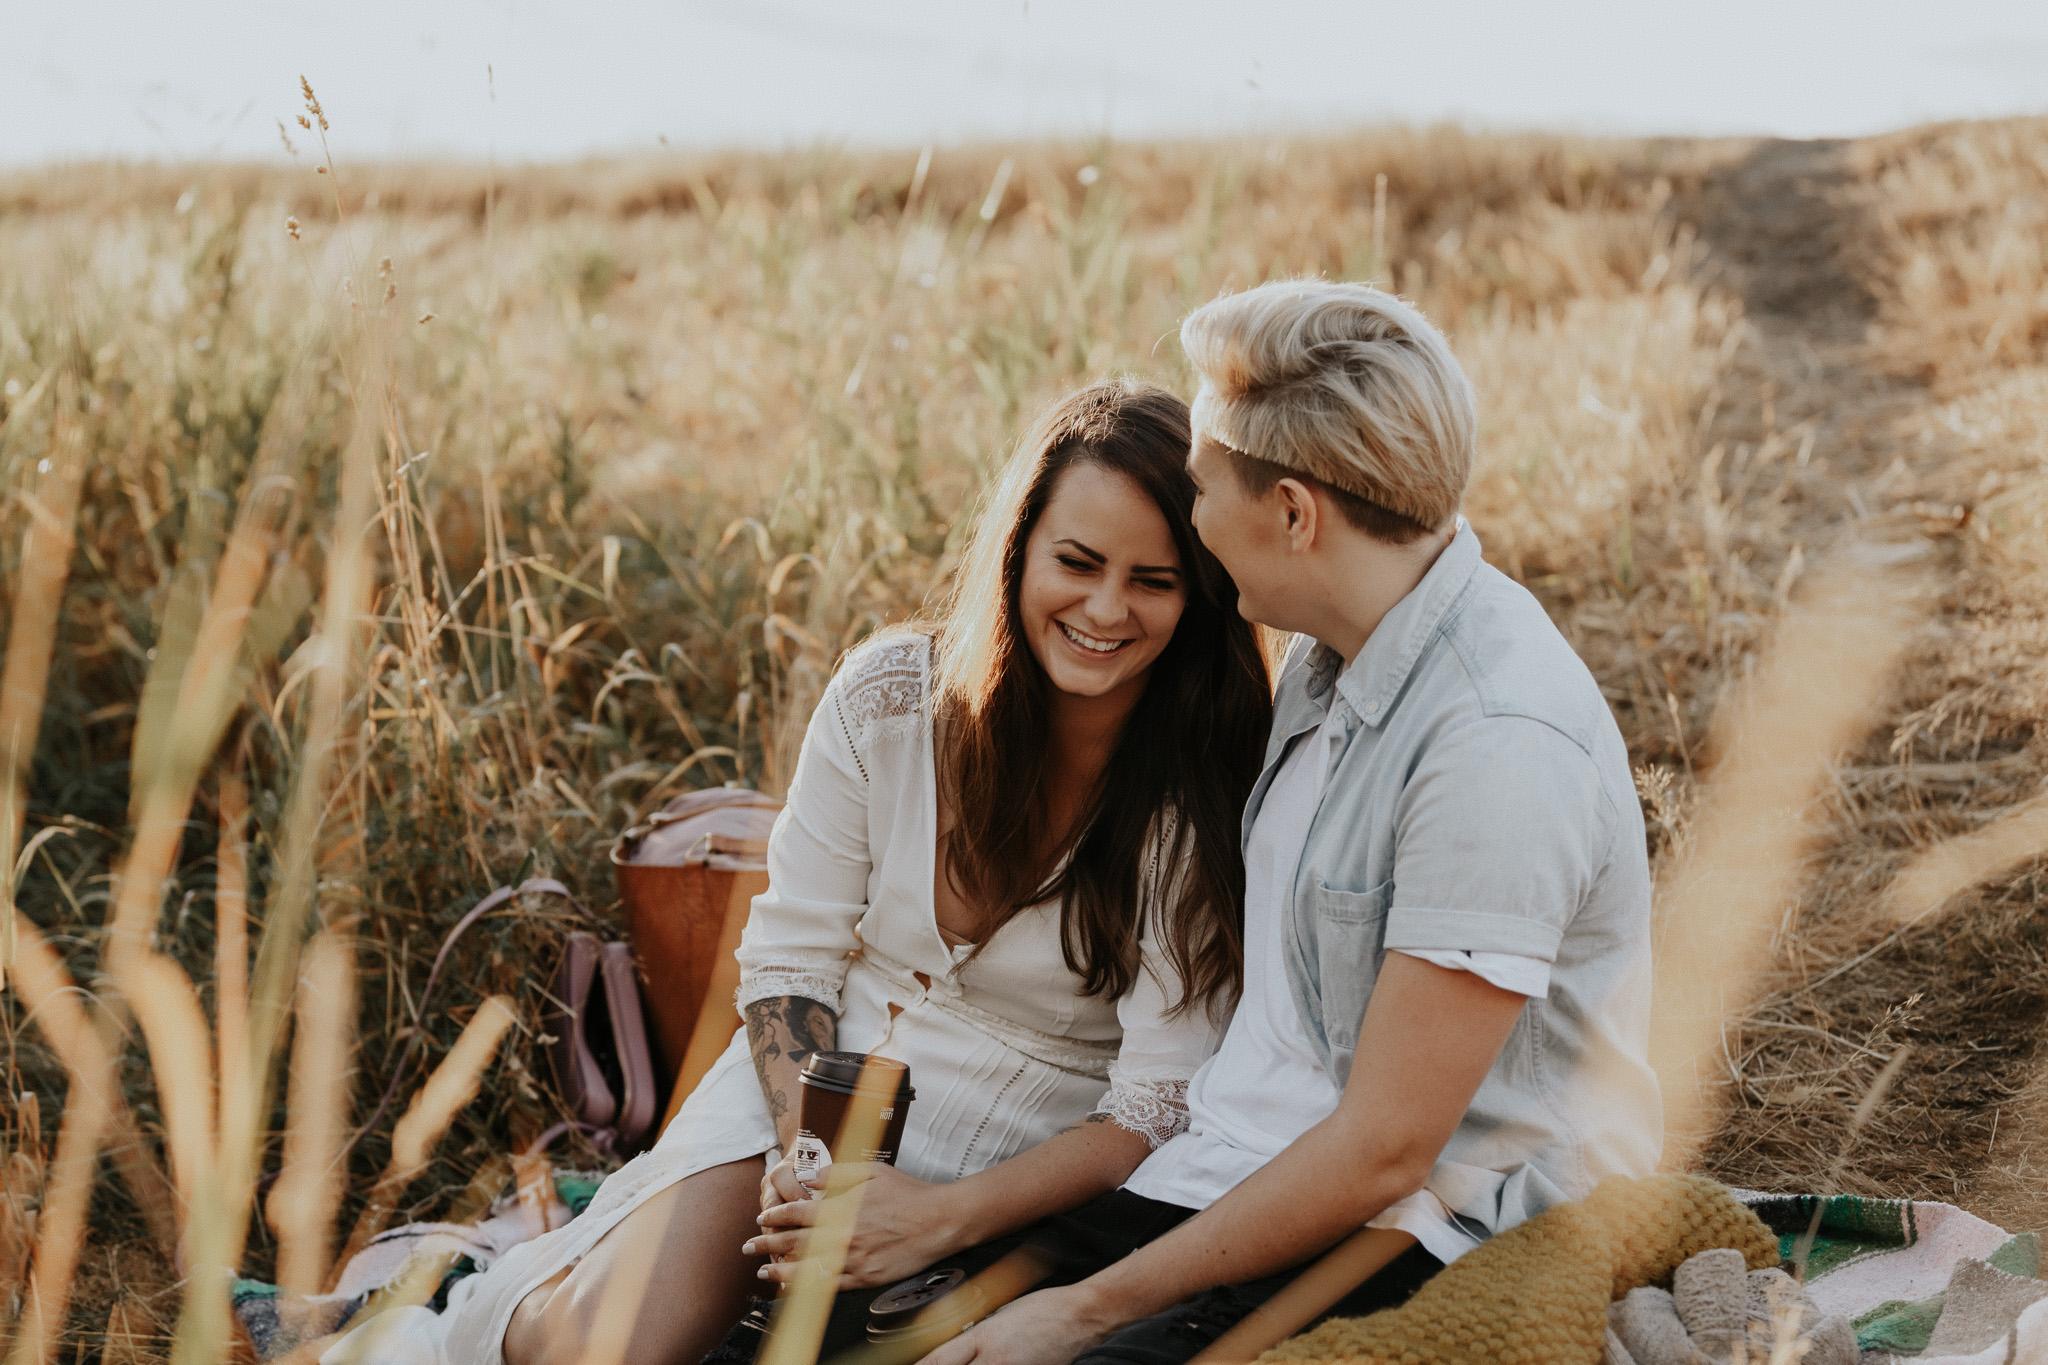 vancouver wedding photographer - lifestyle engagement session-3.jpg